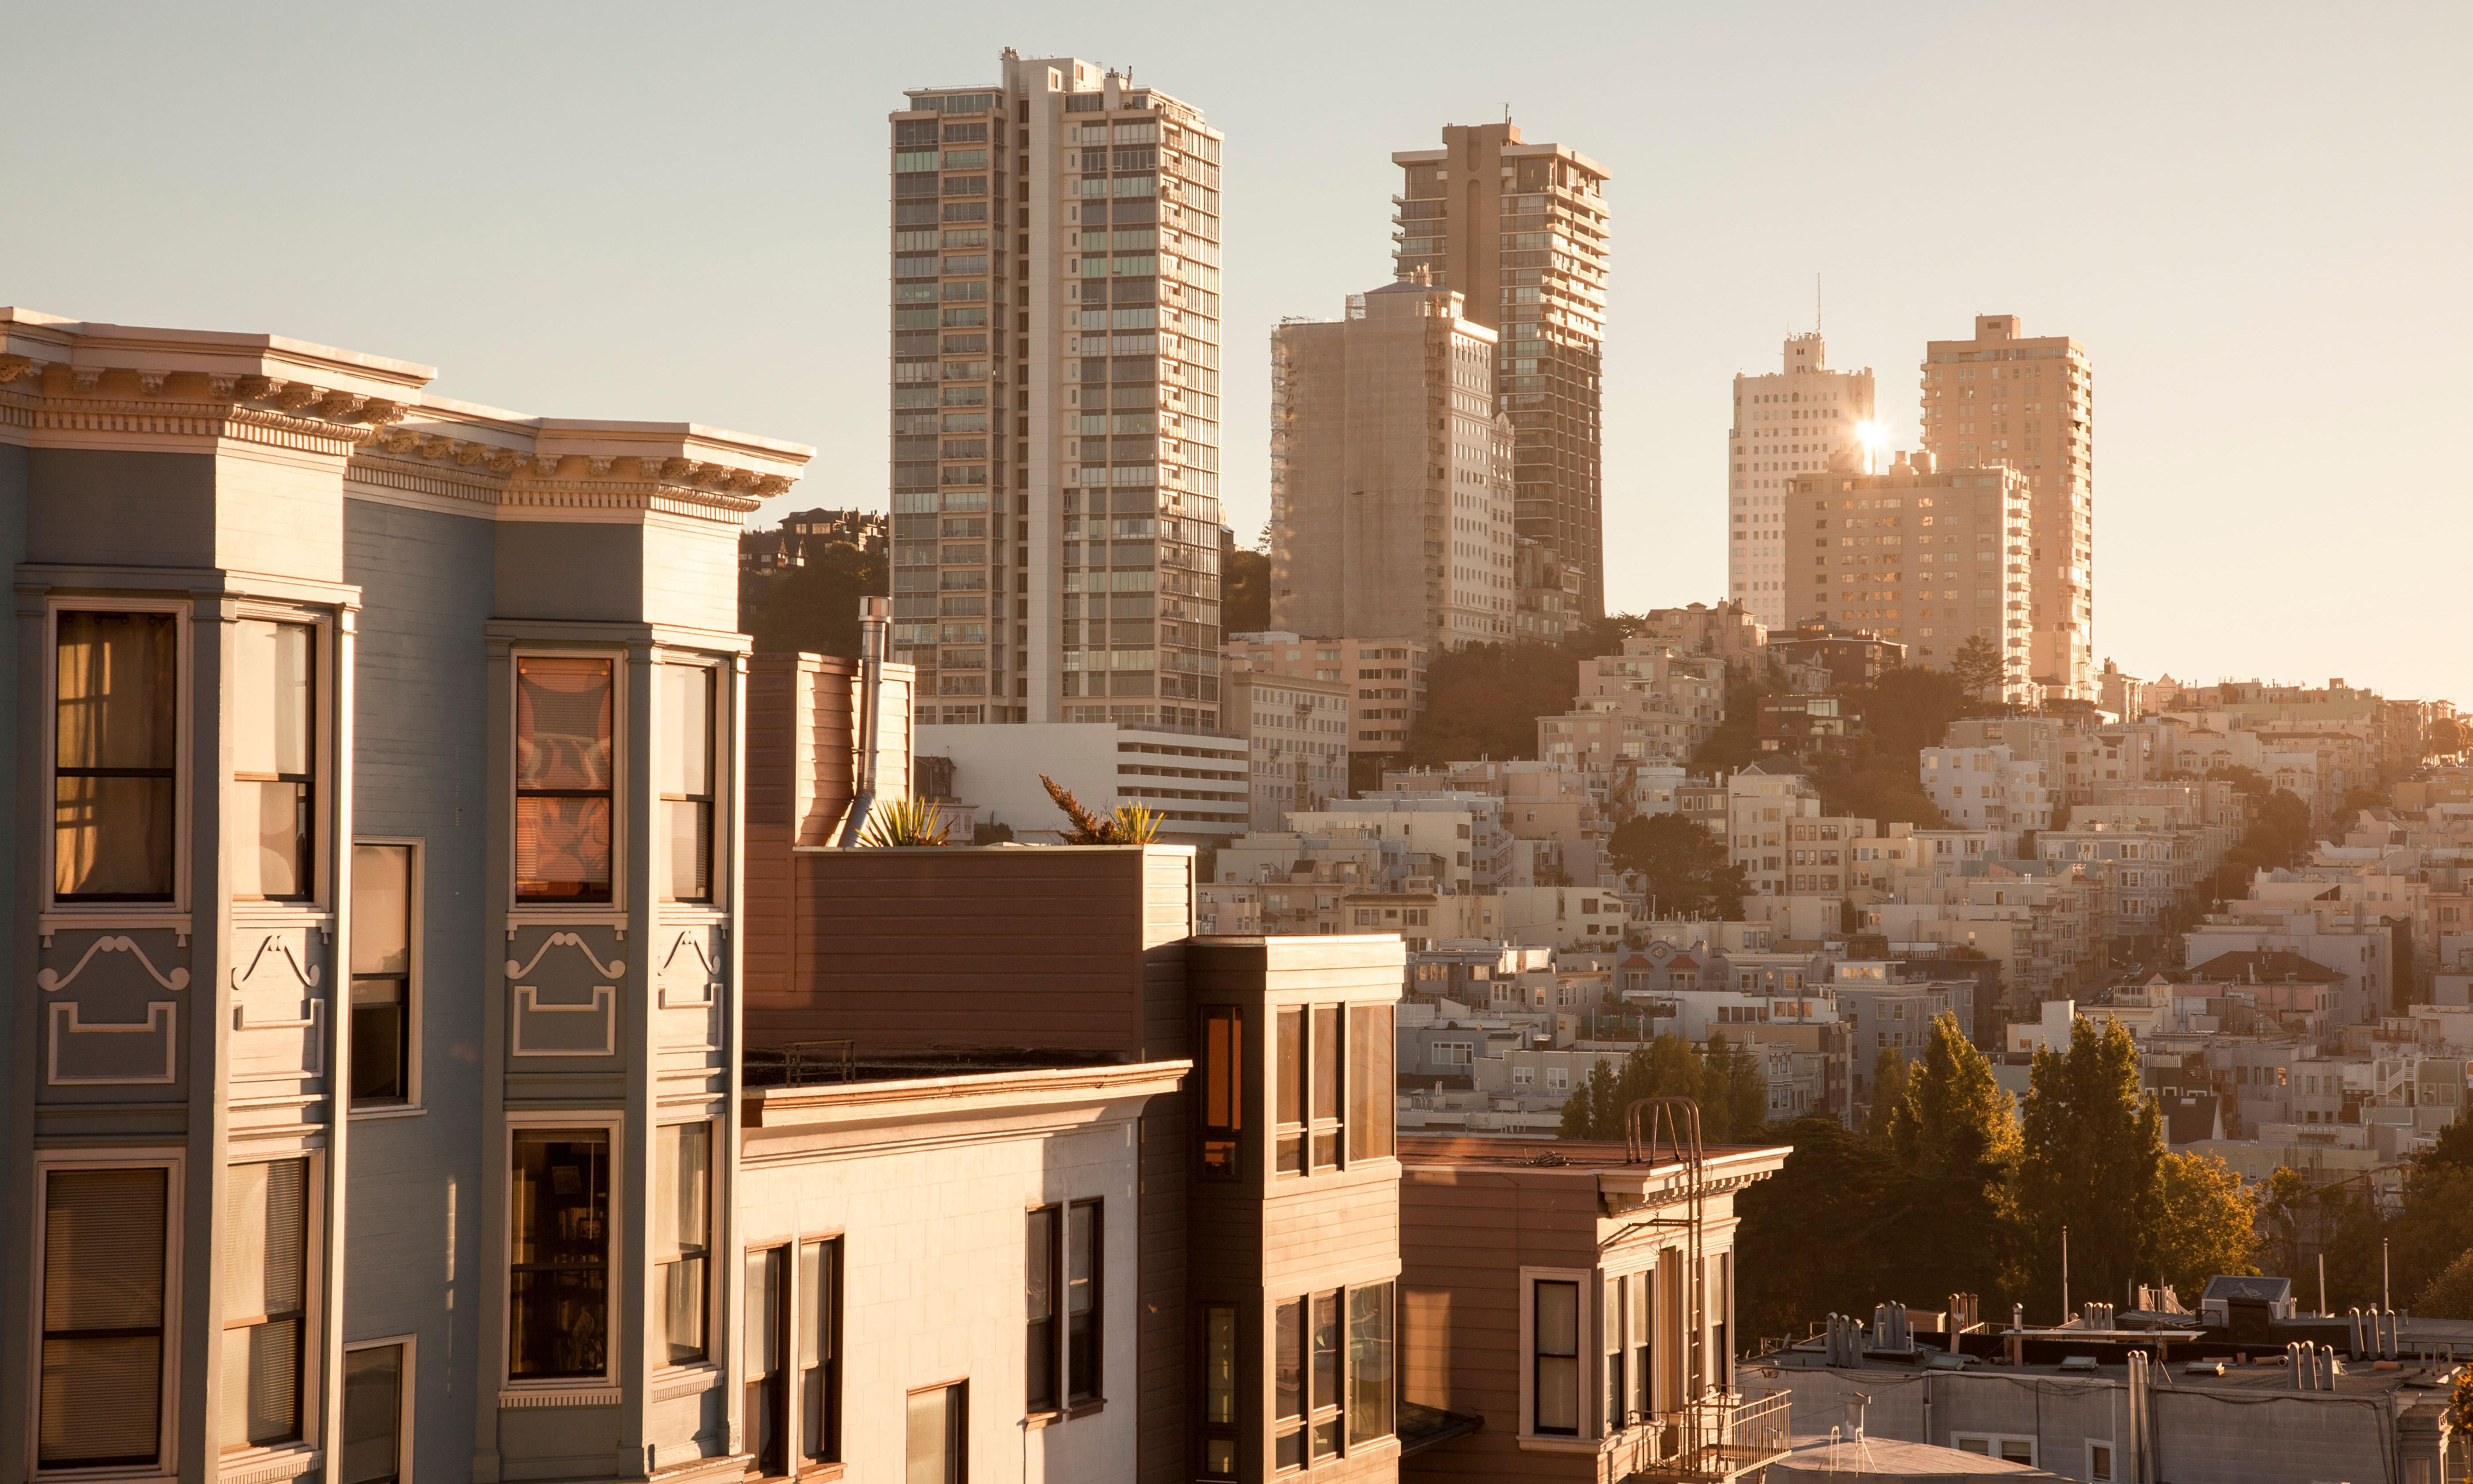 IPO mania: San Francisco braces for 'earthquake' of new tech millionaires